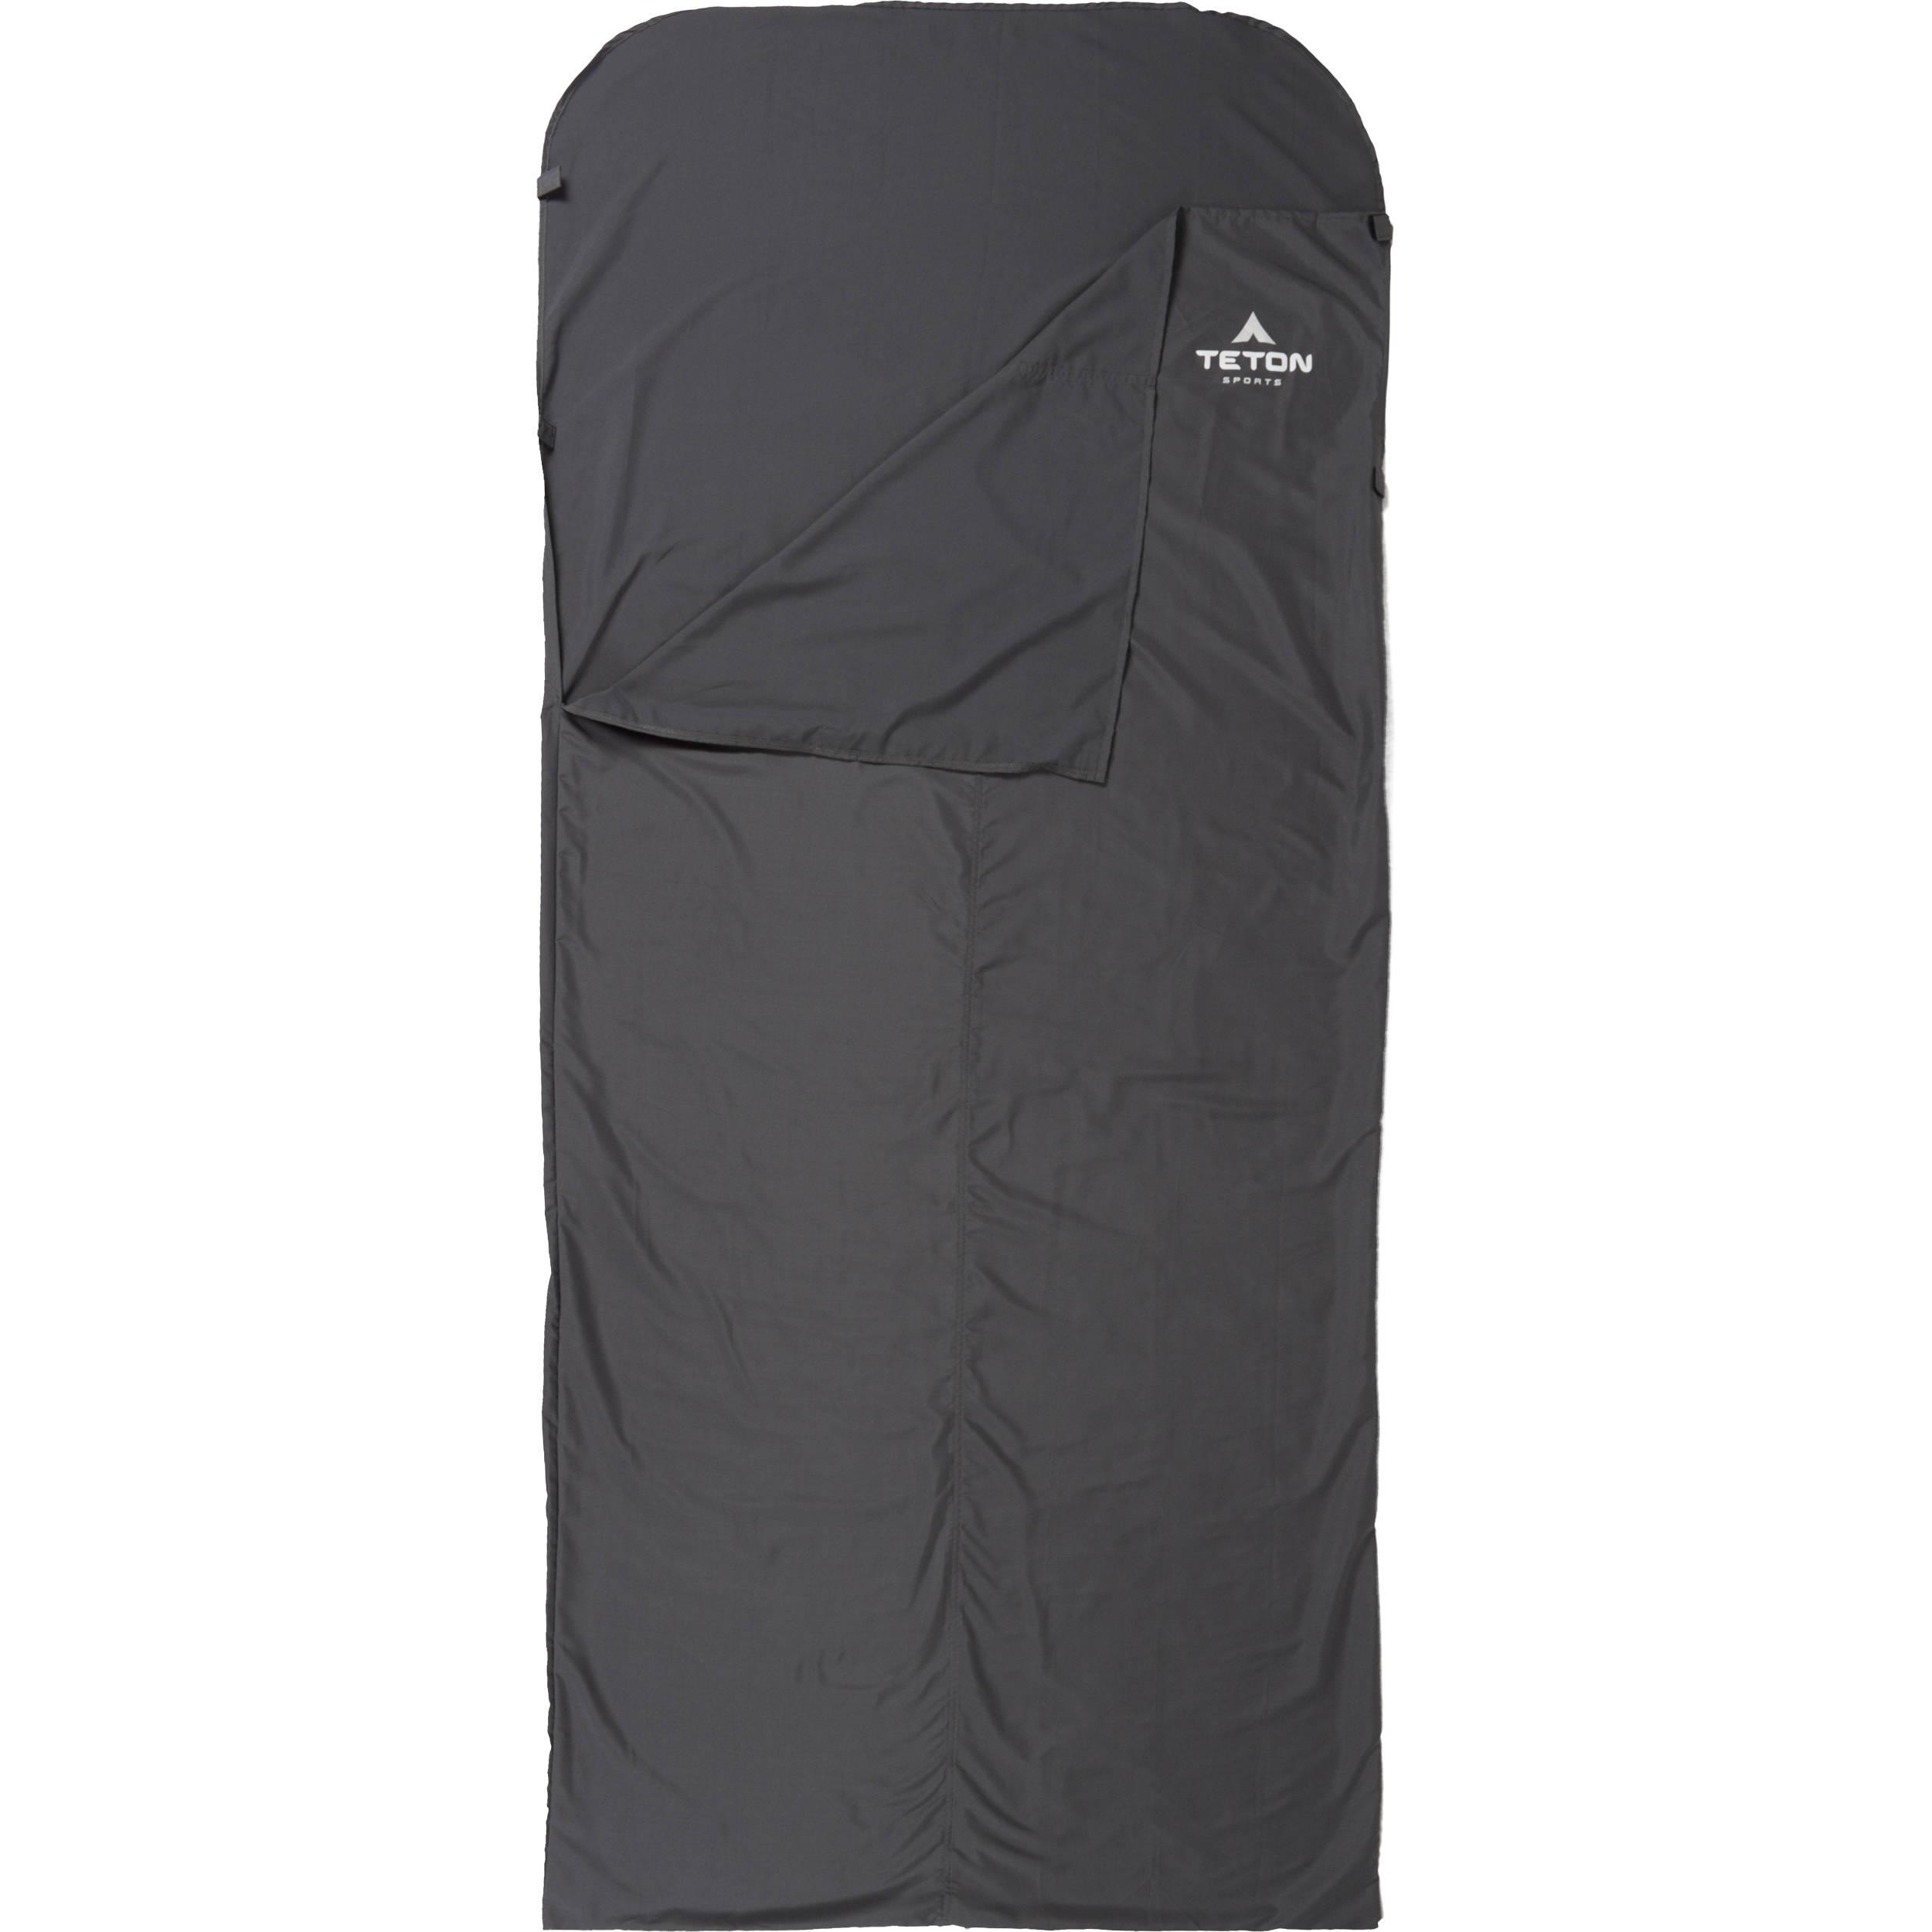 Teton Sports Xl Sleeping Bag Liner Cotton